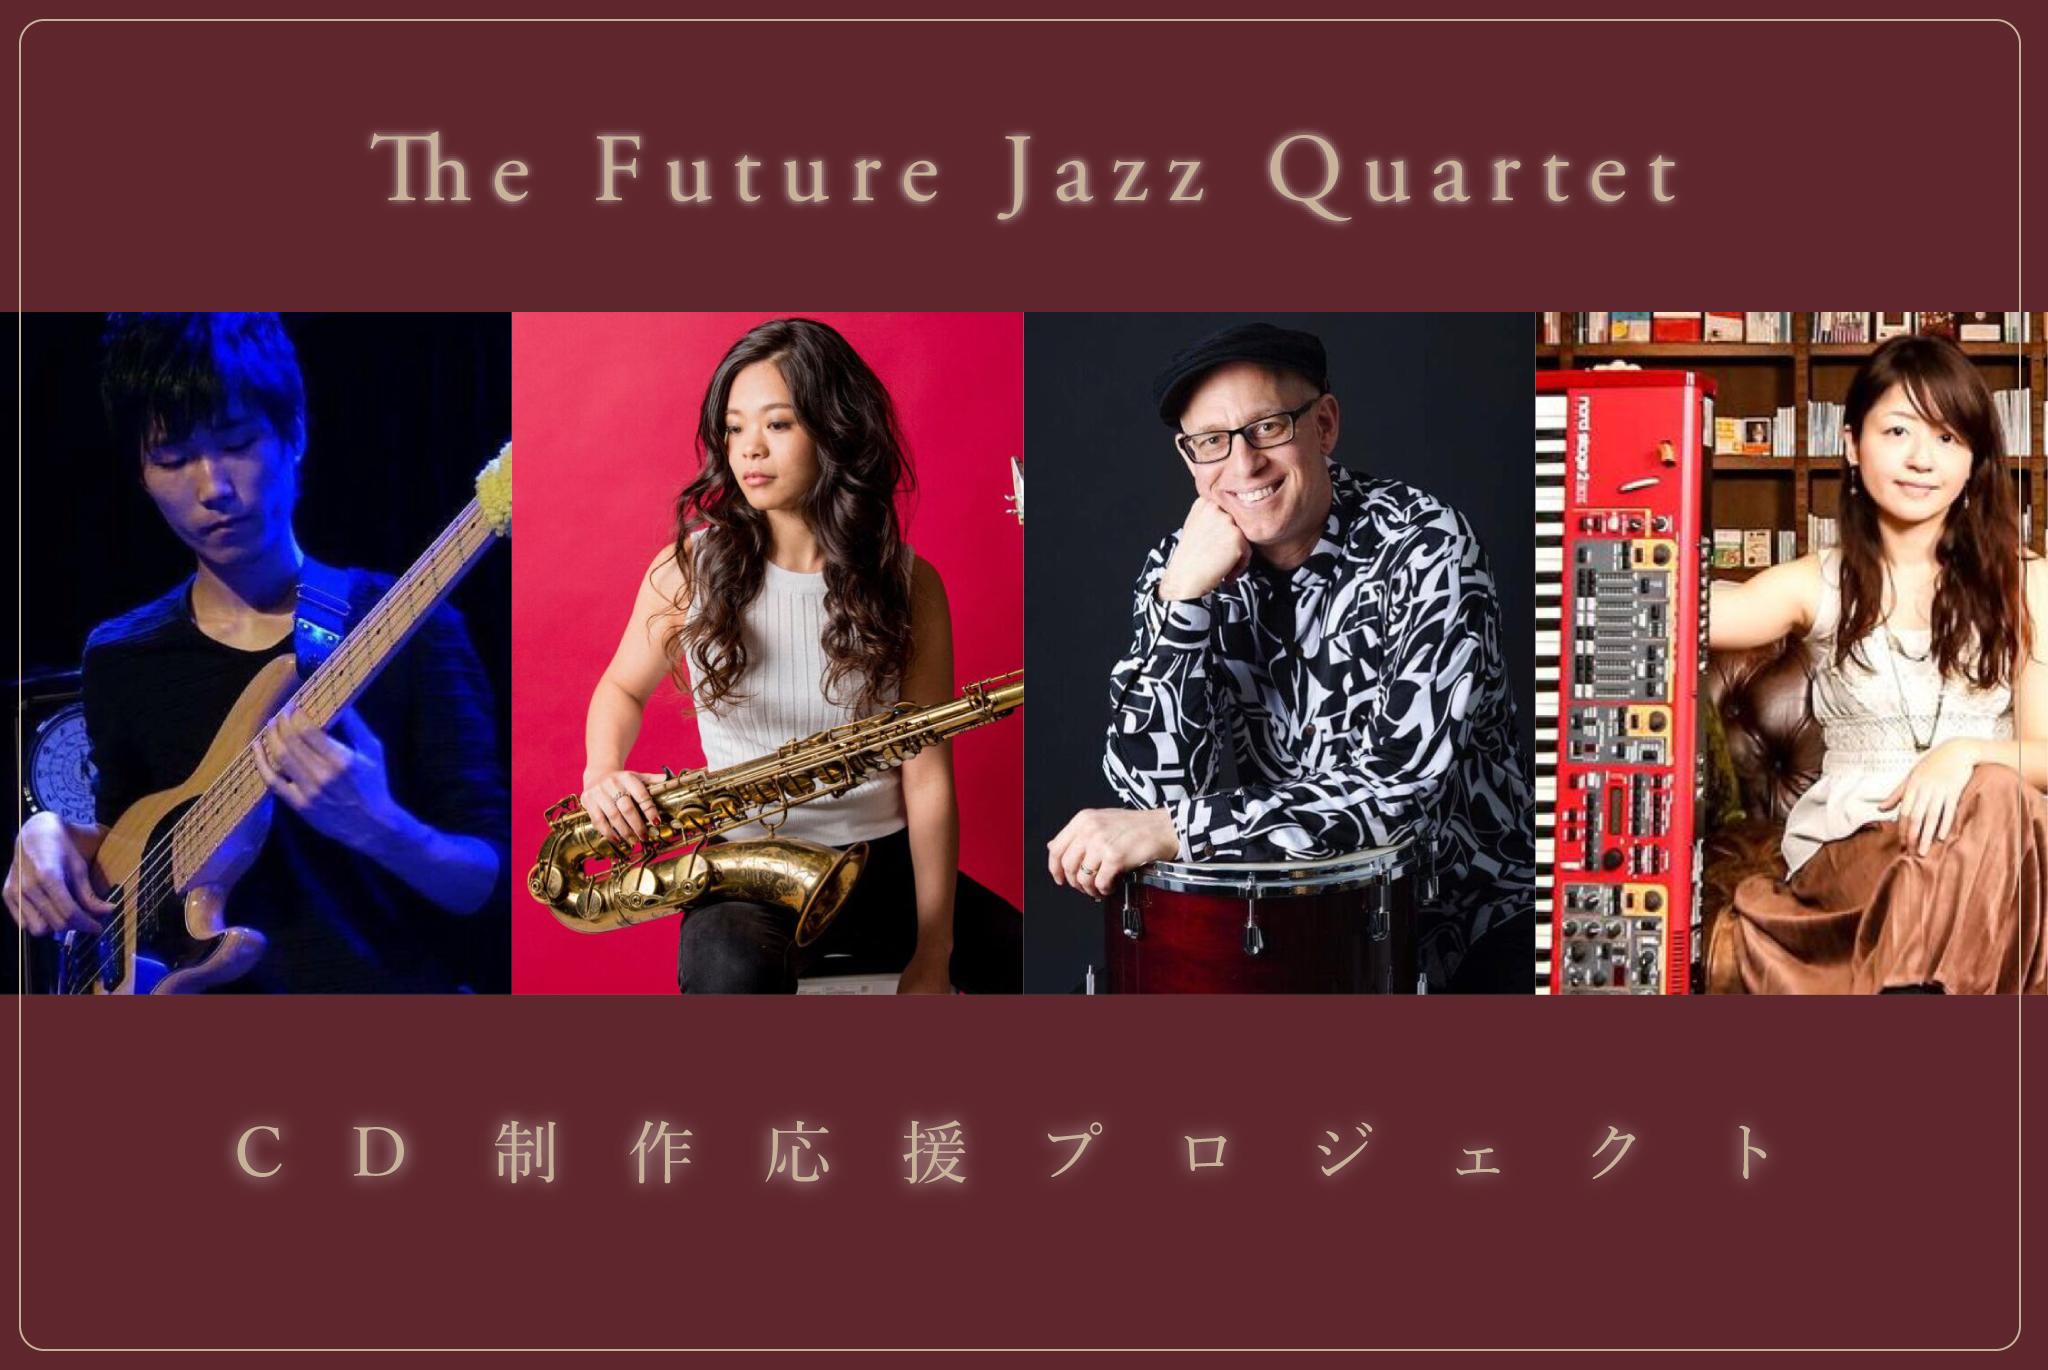 【The Future Jazz Quartet】CD制作応援プロジェクト!